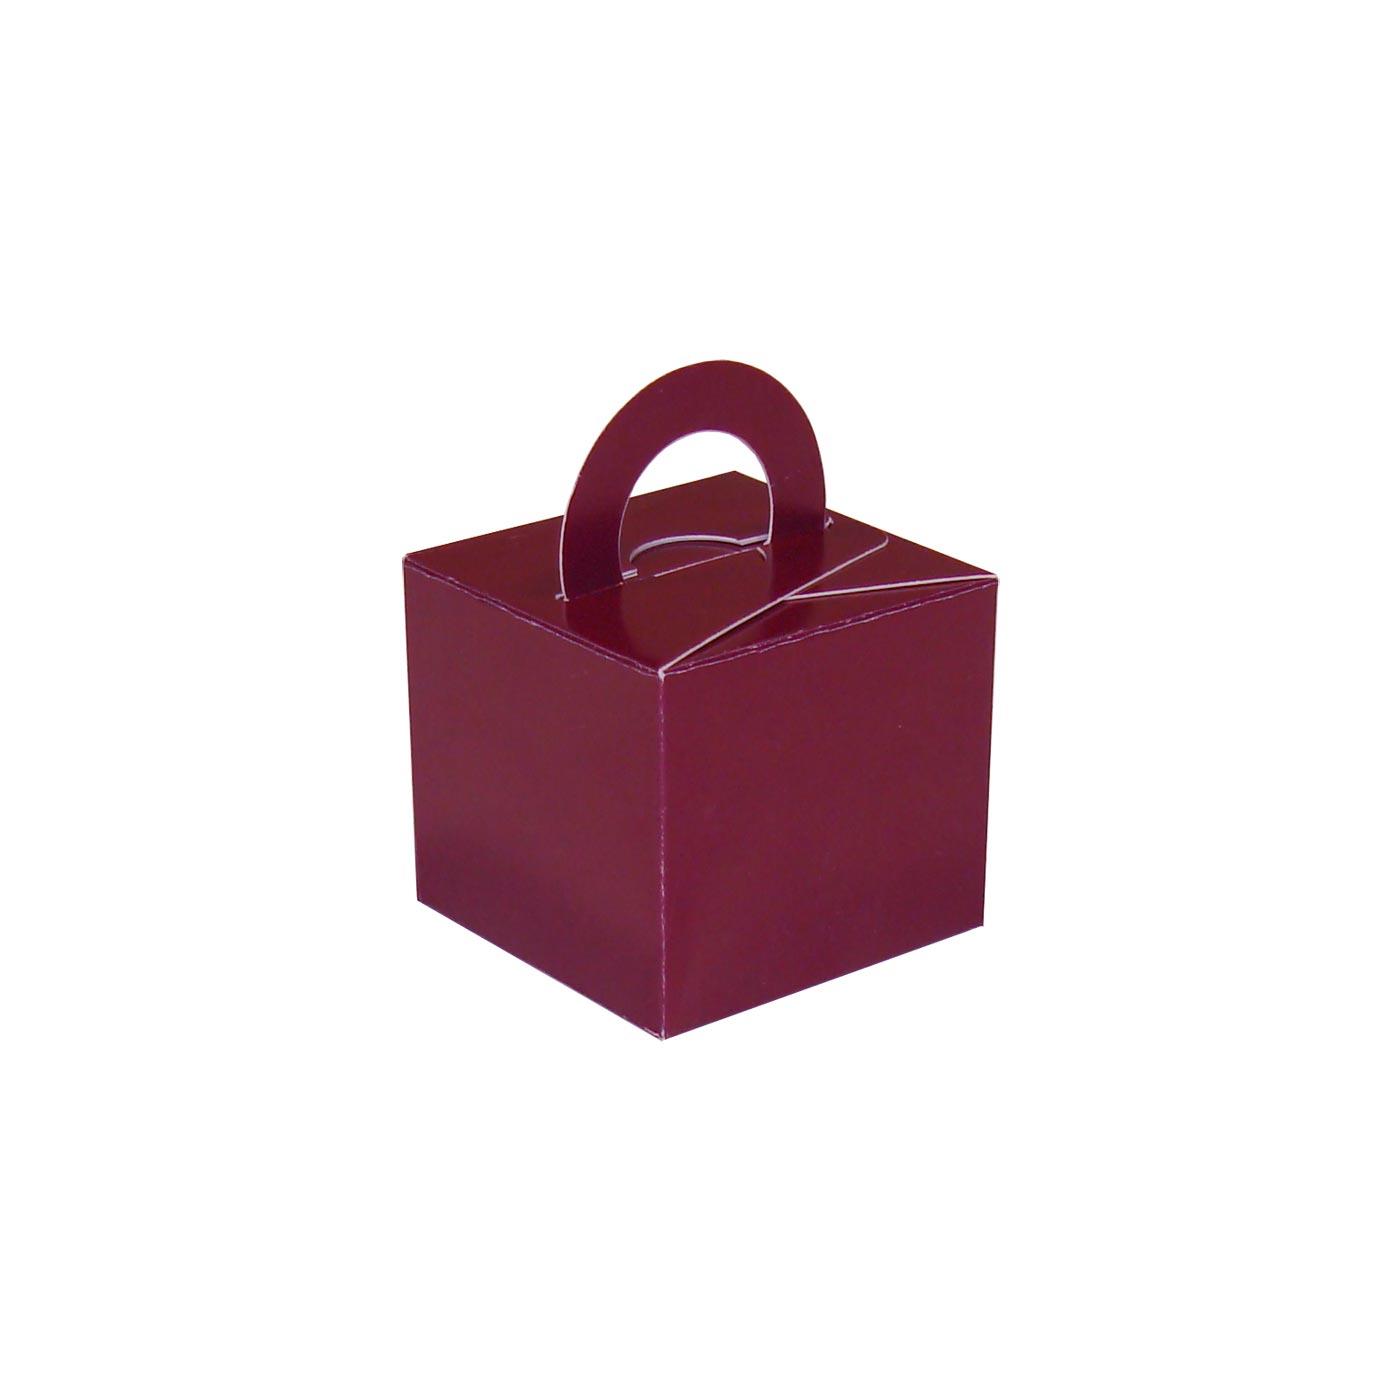 Burgundy Balloon Weight Box